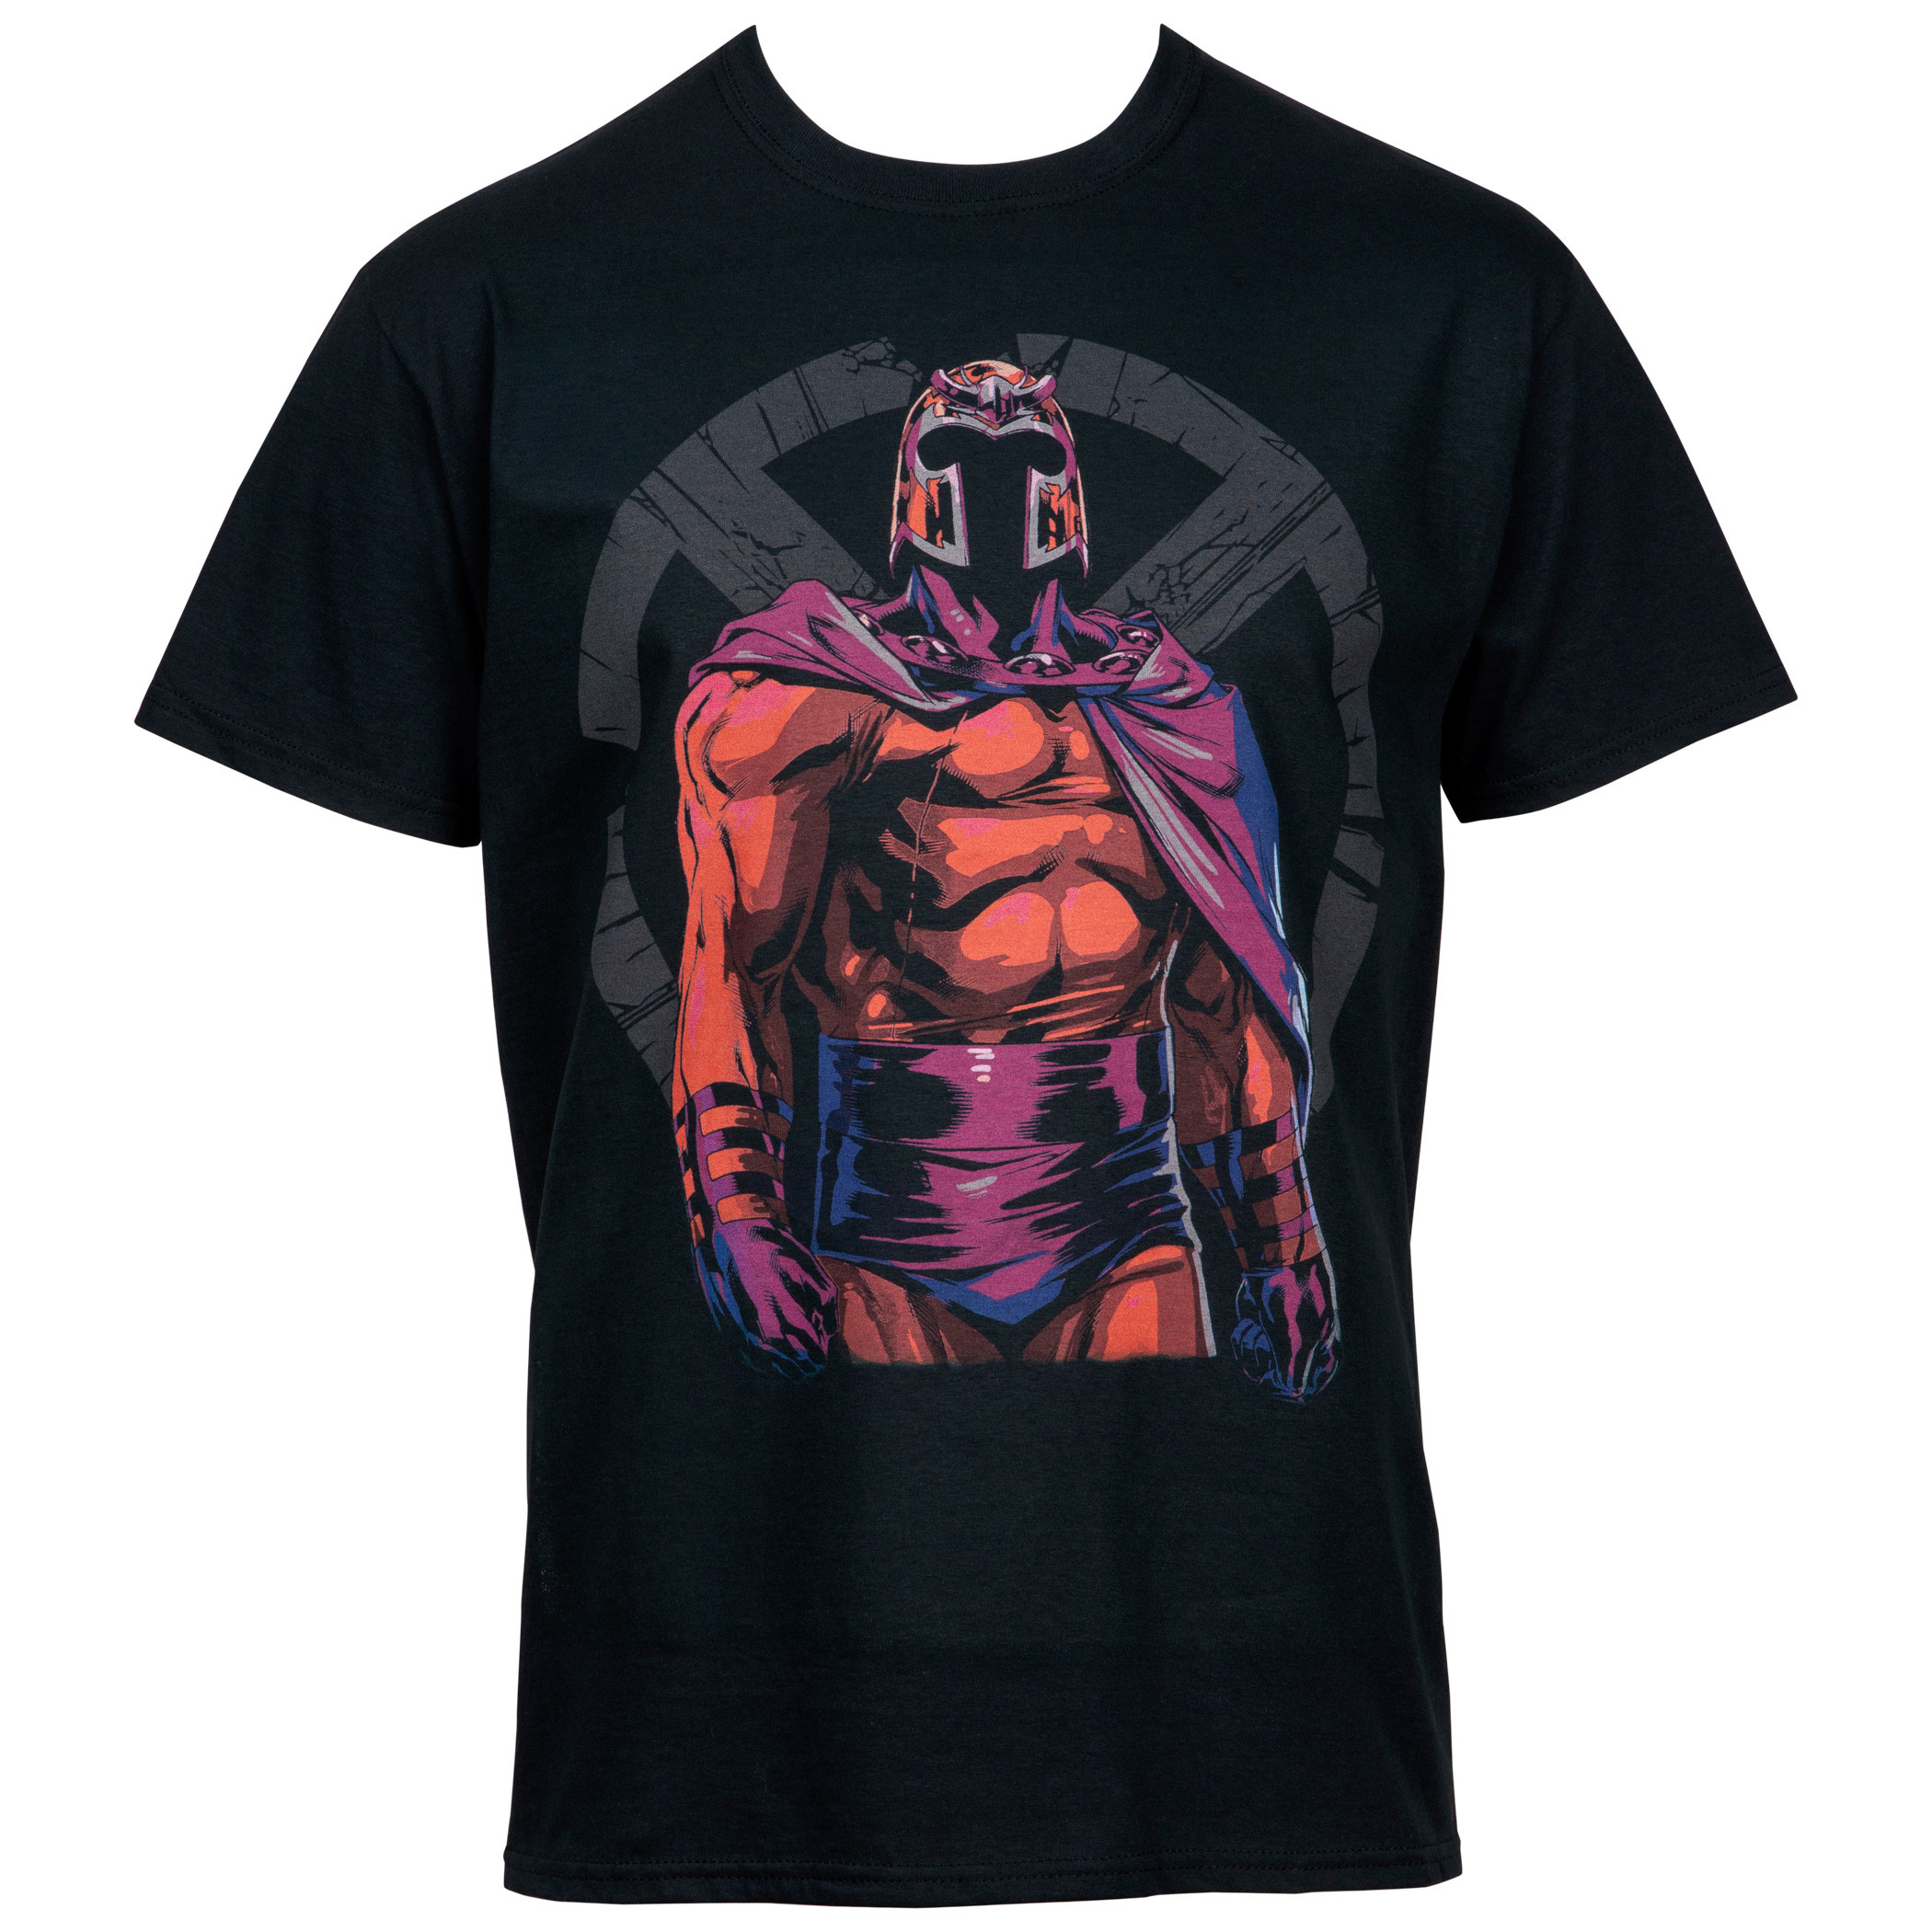 Magneto Shattered X-Men Symbol T-Shirt